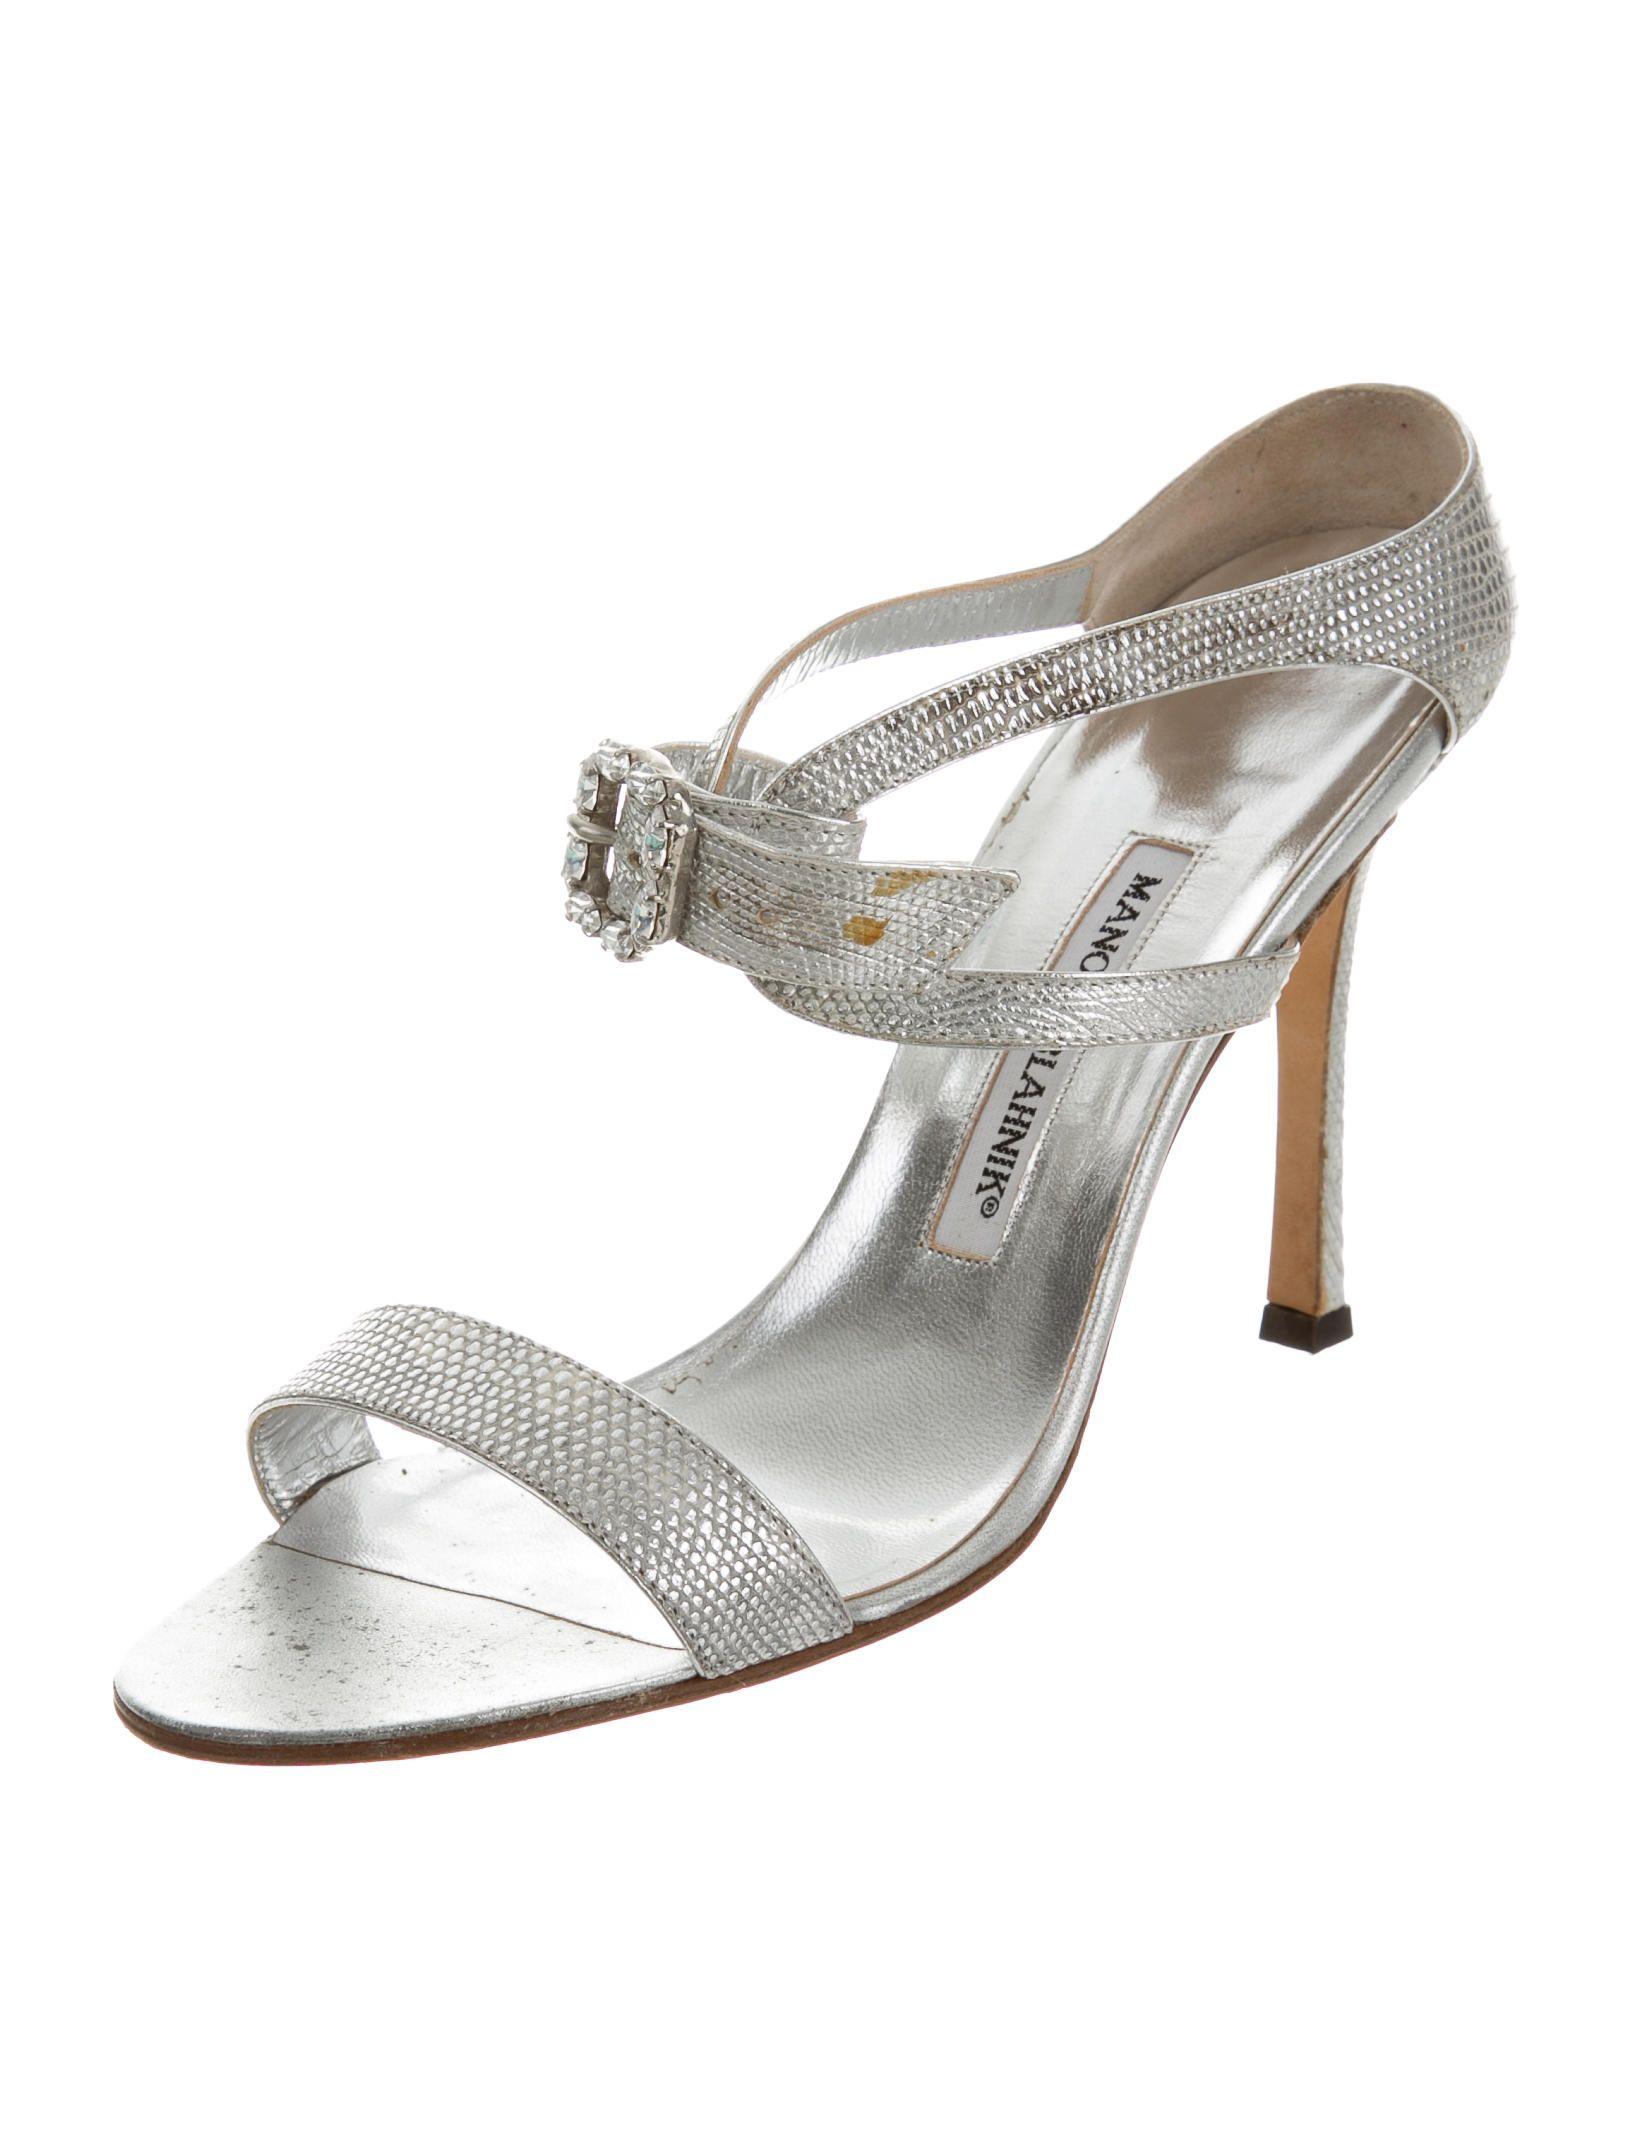 4182fe4b6e6 Manolo Blahnik Jewel Lizard Sandals - Shoes - MOO51180